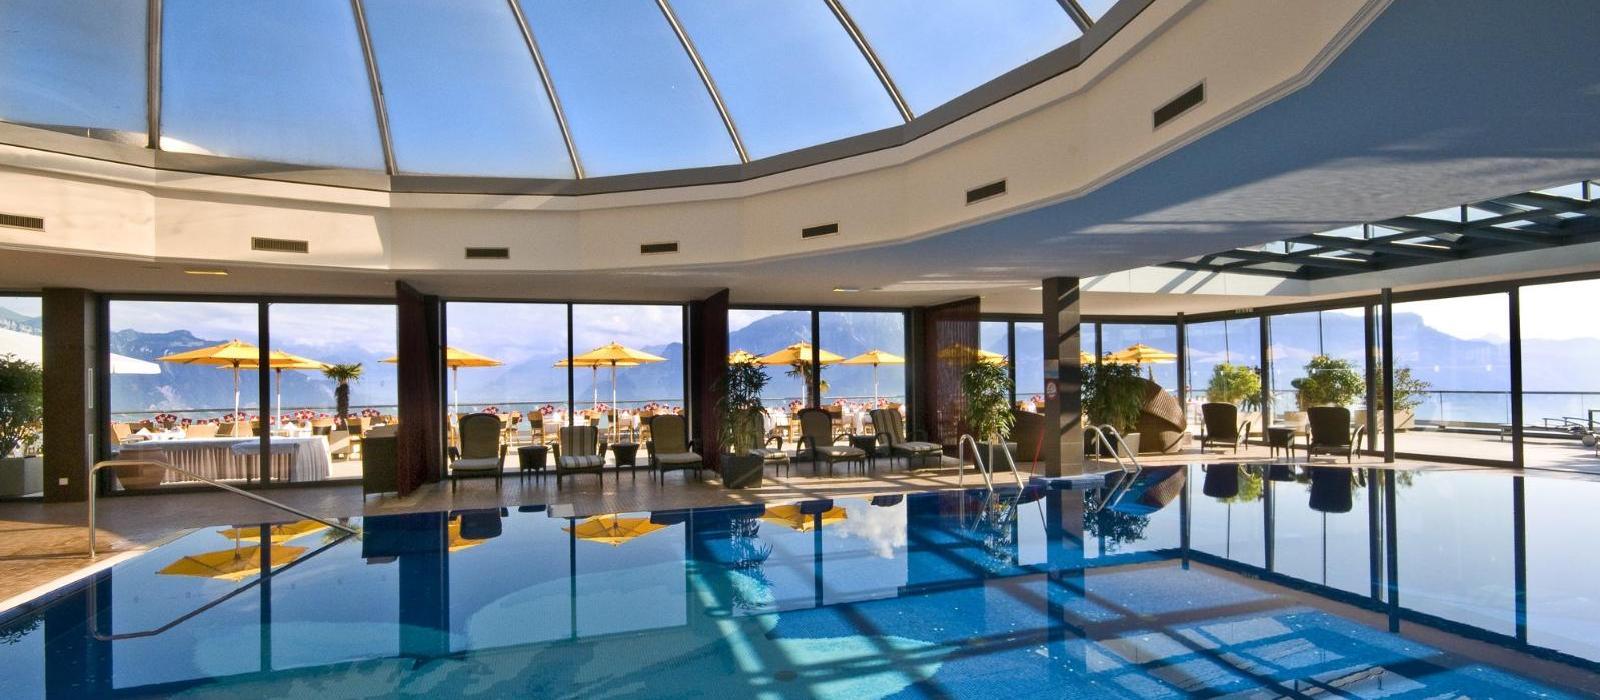 米兰朵度假酒店及Spa(Le Mirador Resort and Spa) 水疗中心图片  www.lhw.cn